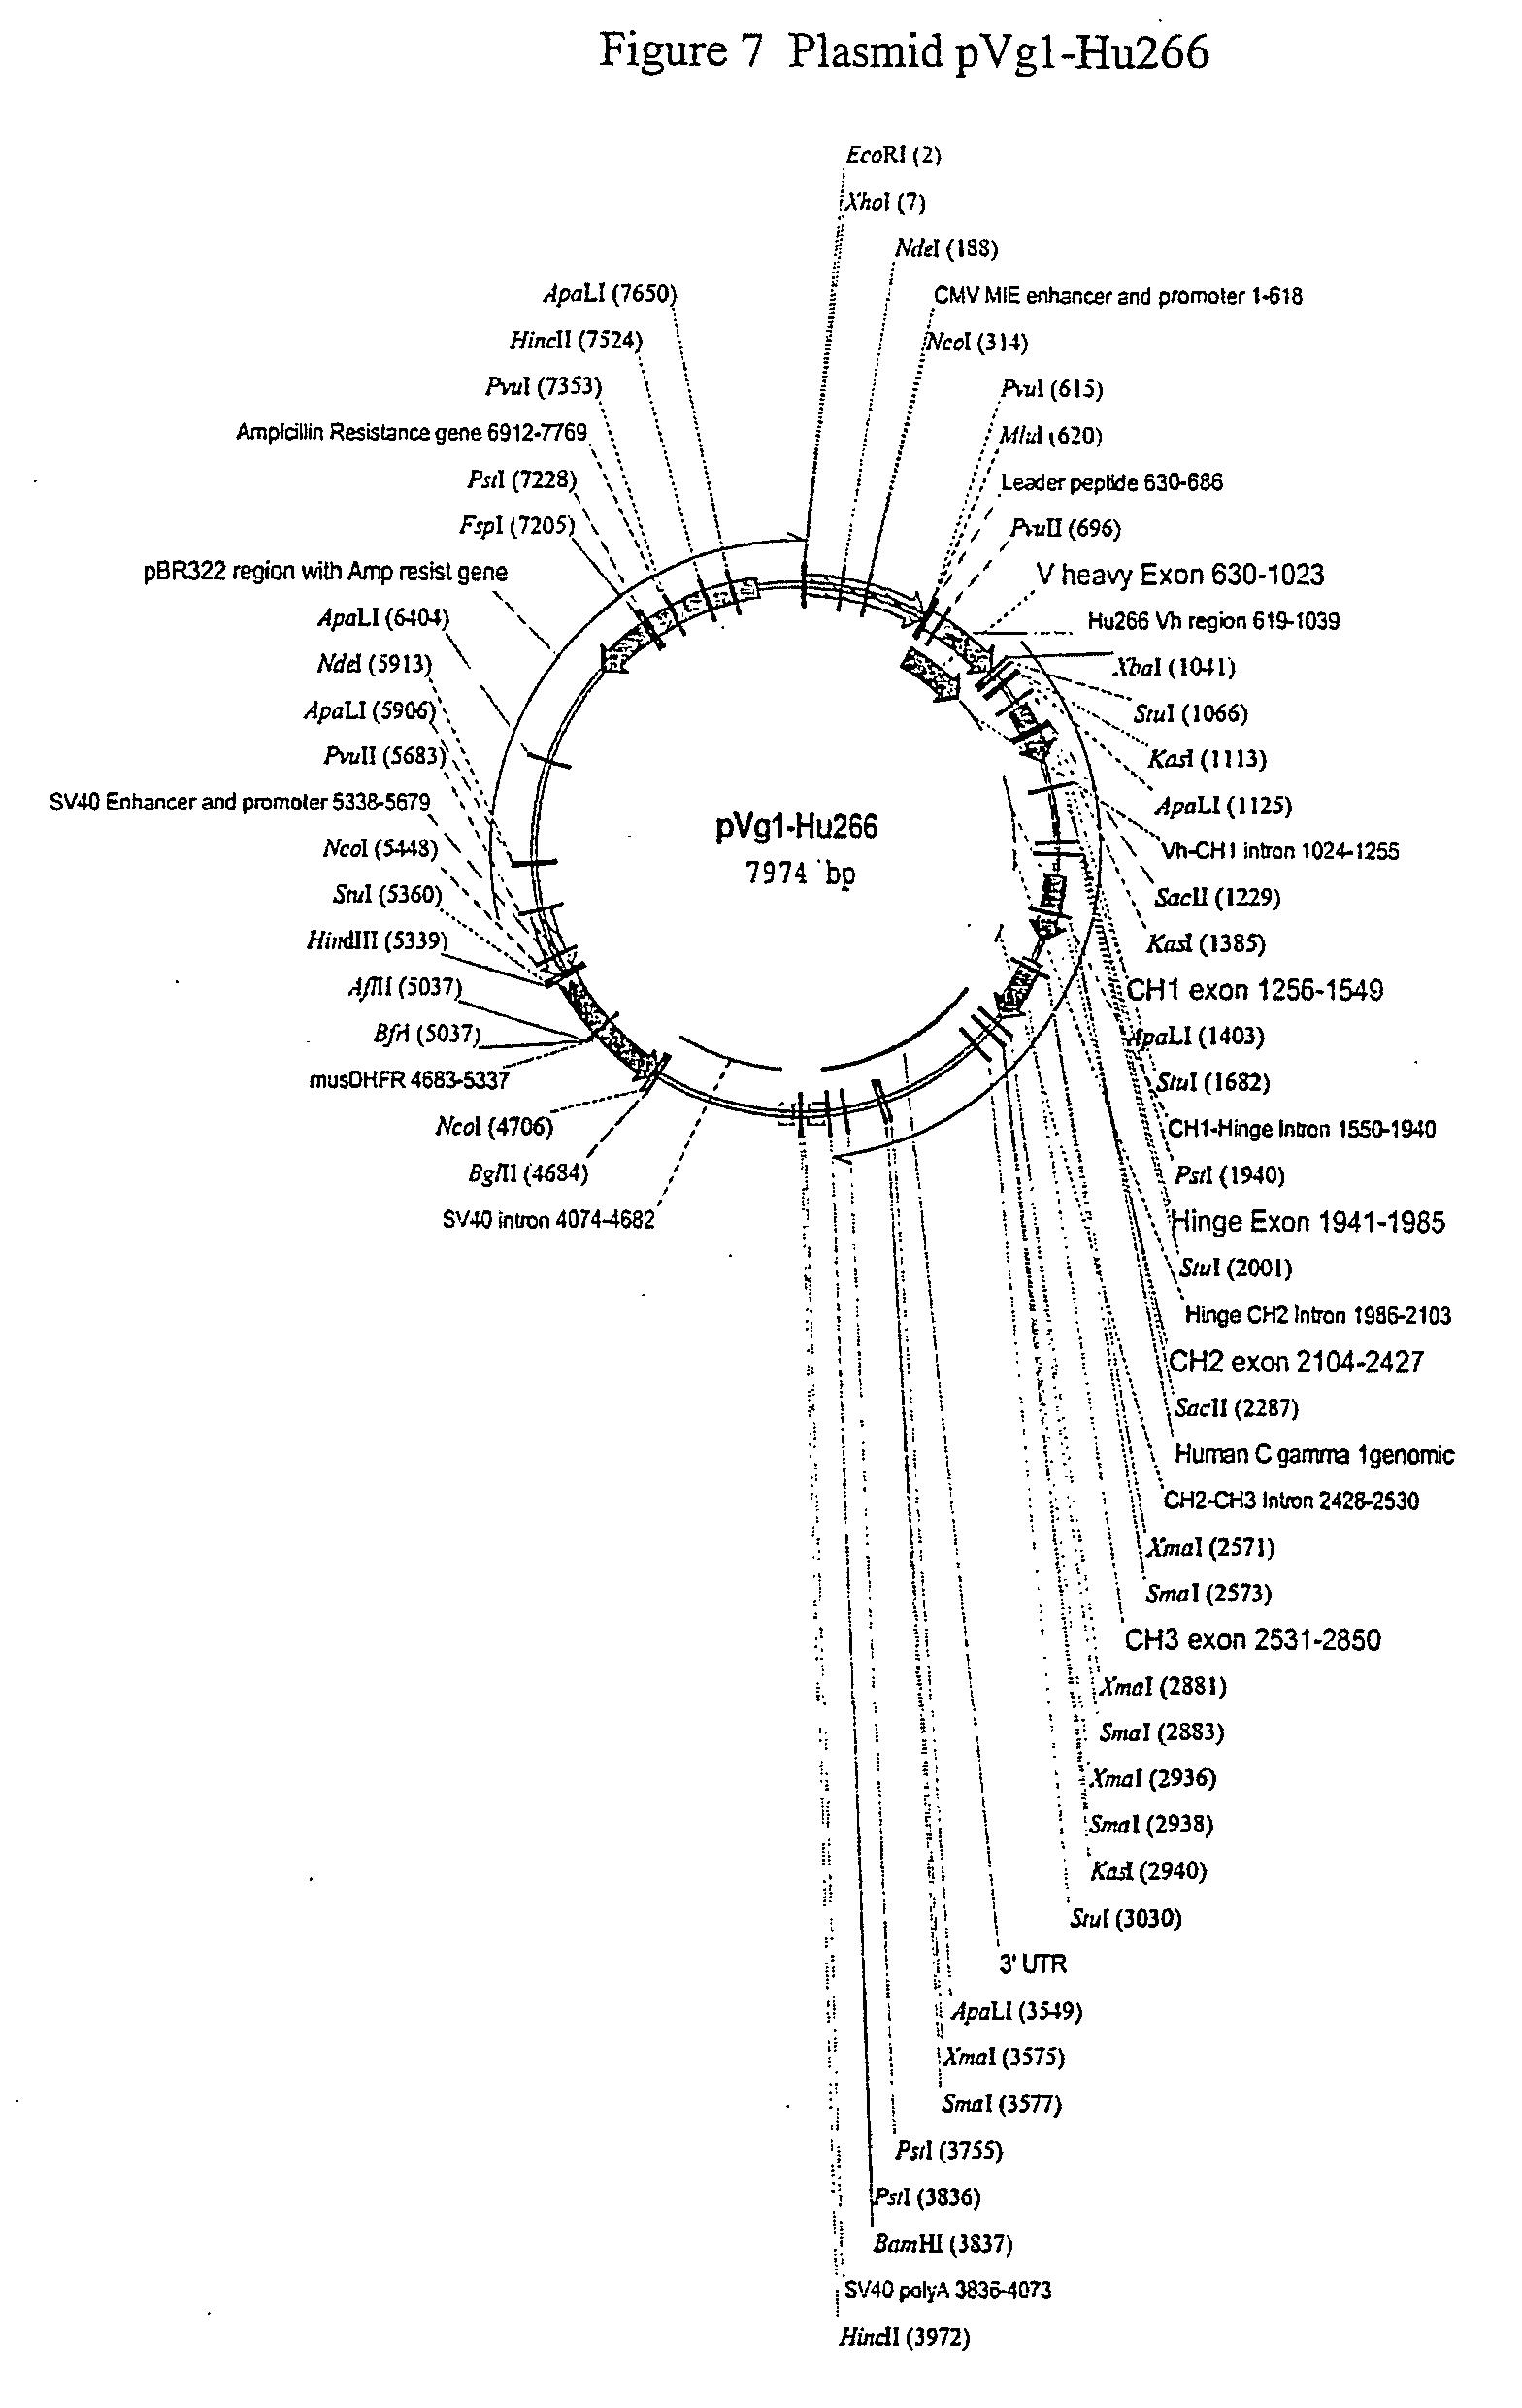 Steven R. Holtzman Digital Mantras